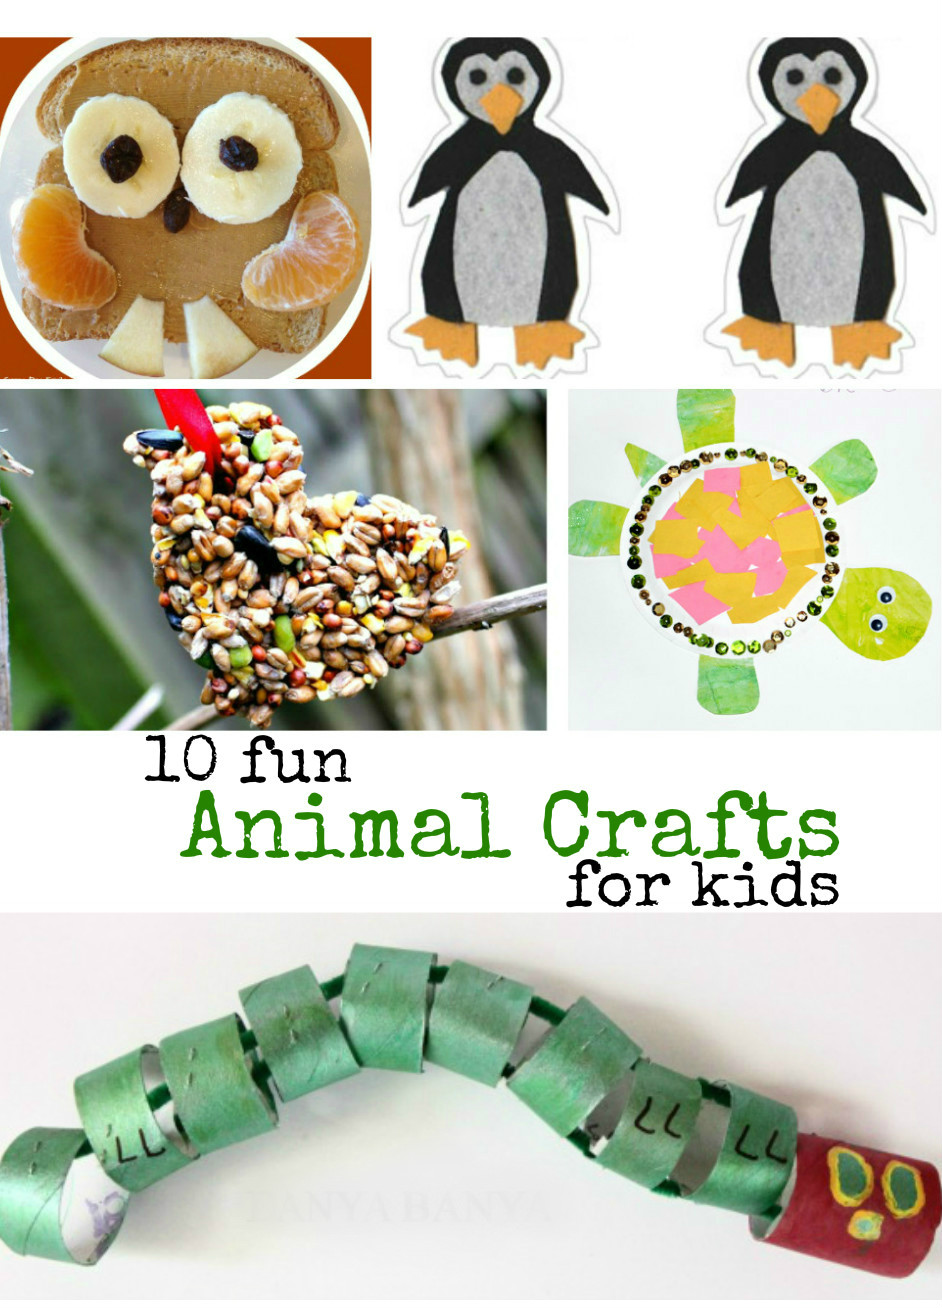 animalcrafts